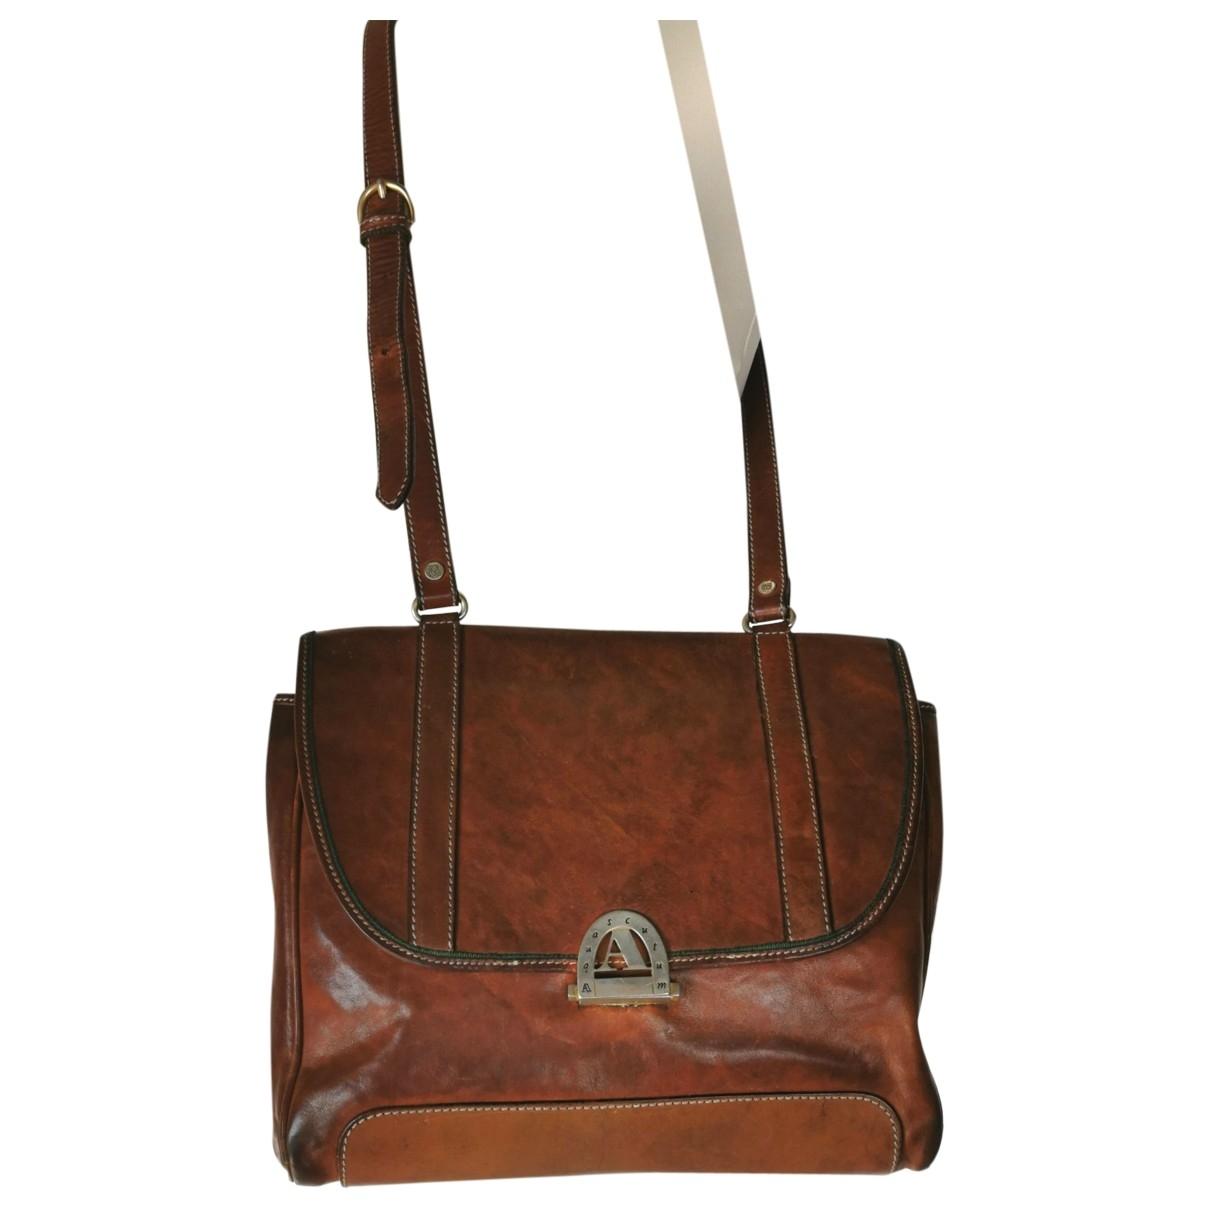 Aquascutum \N Leather handbag for Women \N